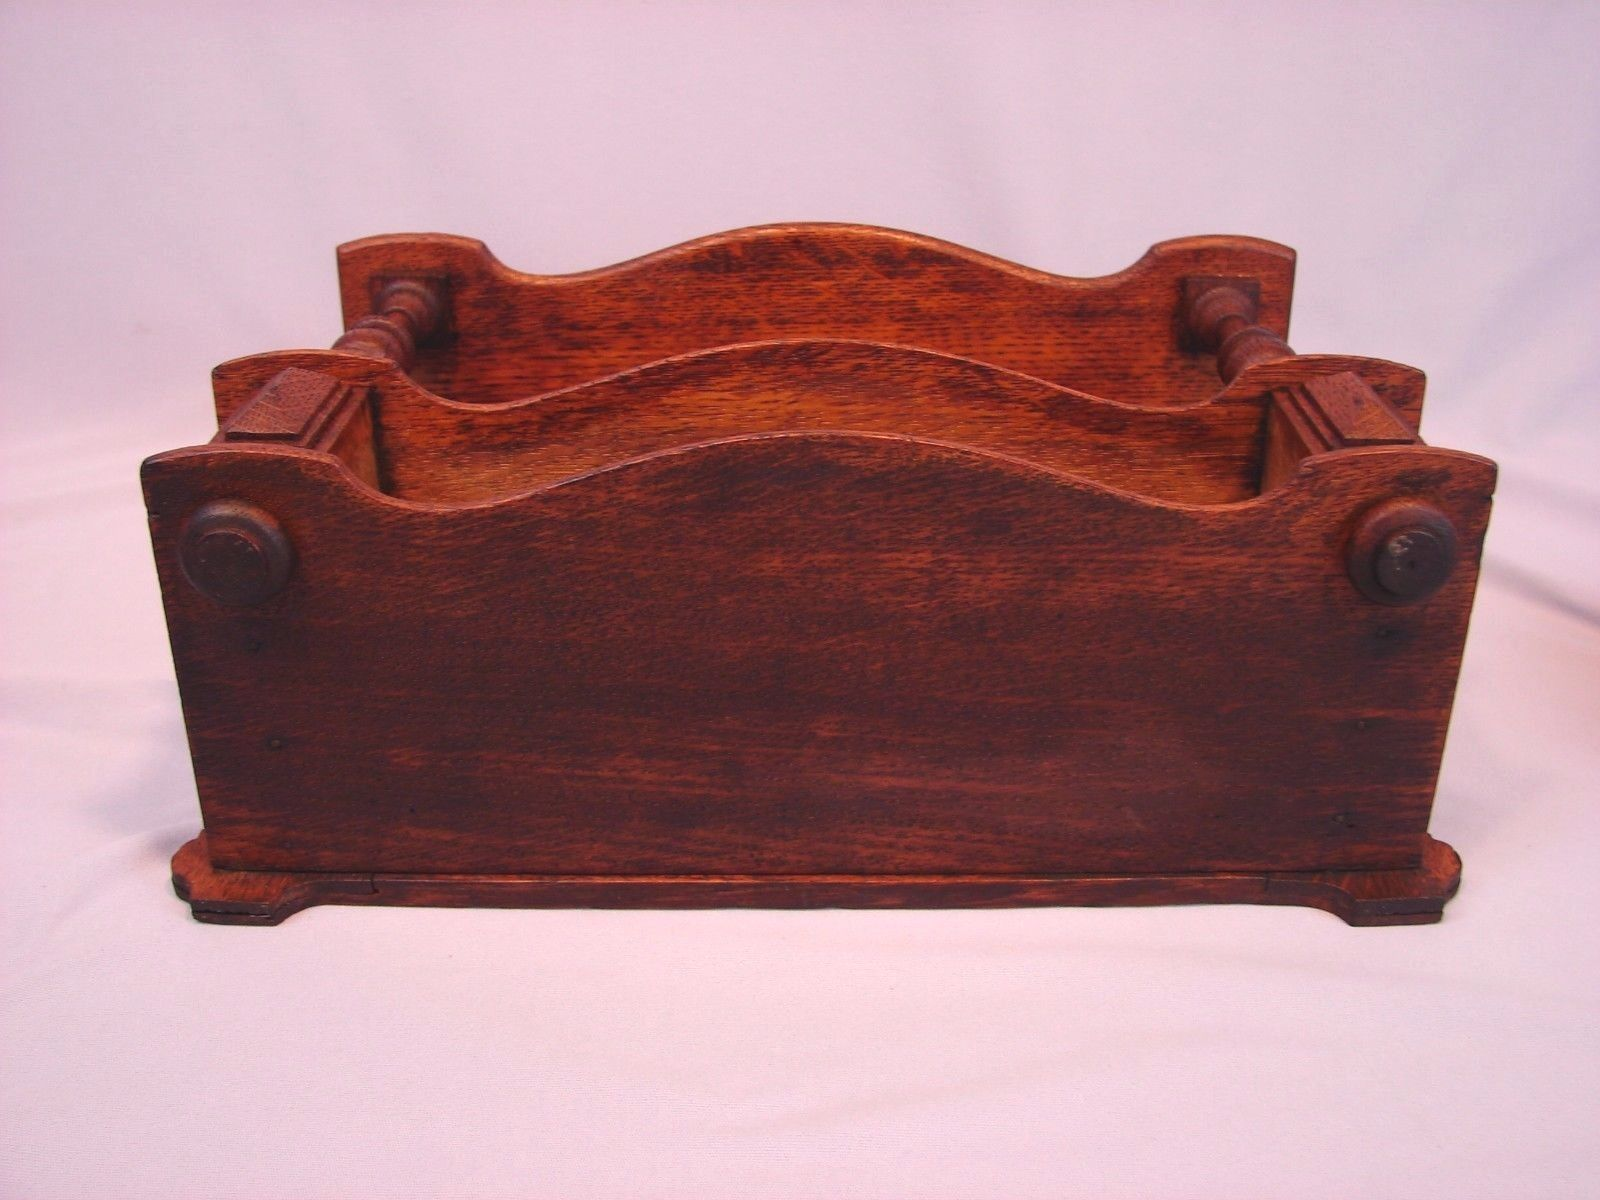 Antique Victorian Petite Wall Hung Oak Curio Cabinet w Good Original Finish | eBay